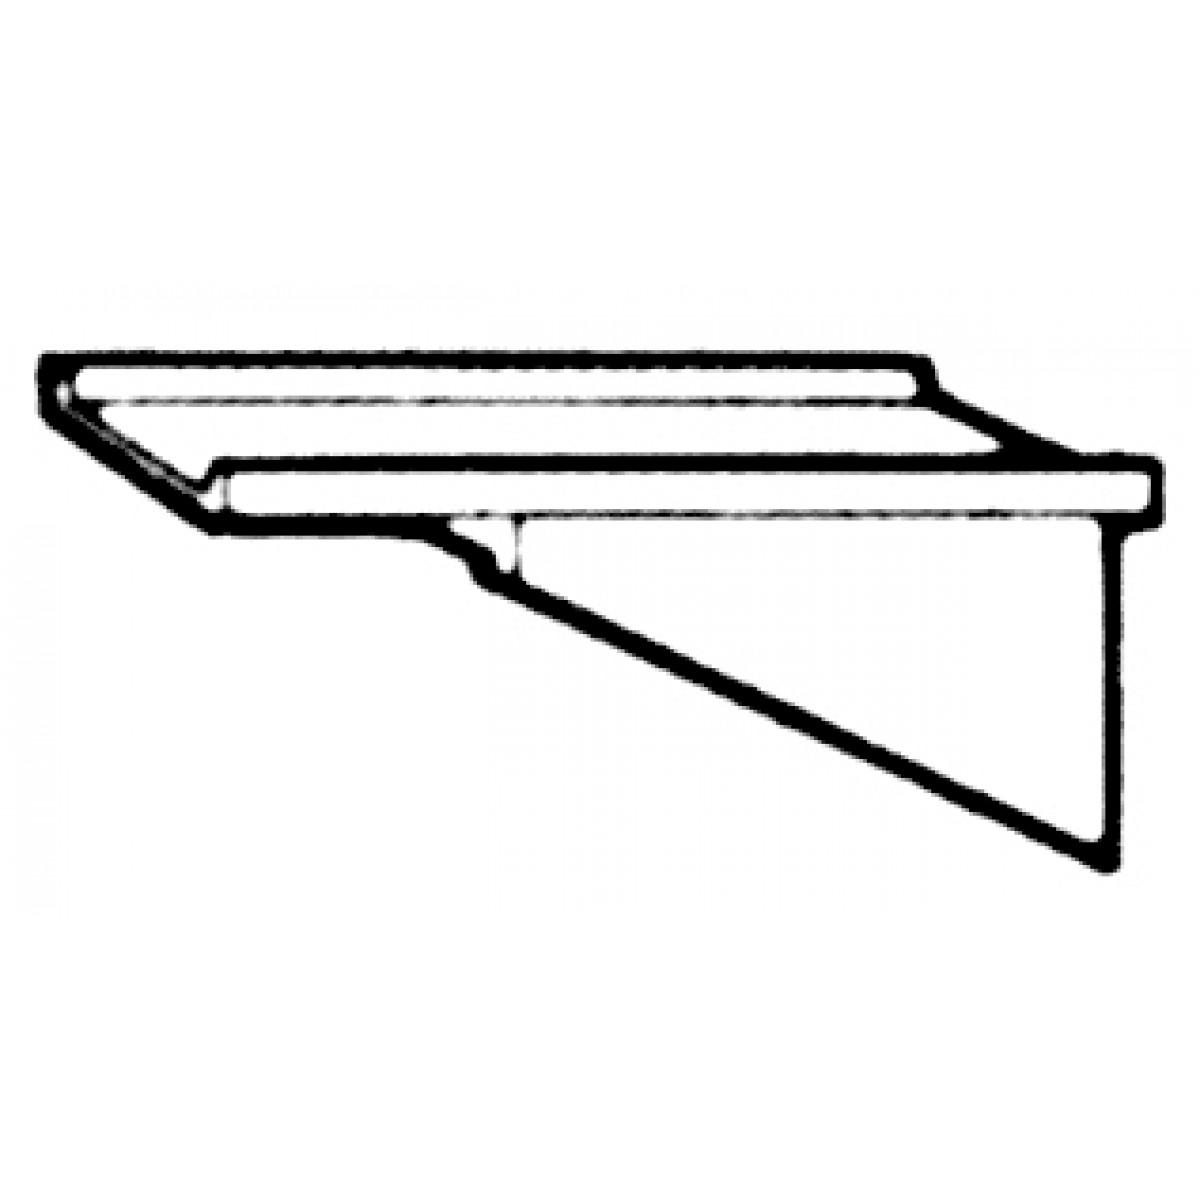 Konsolvenstre-35